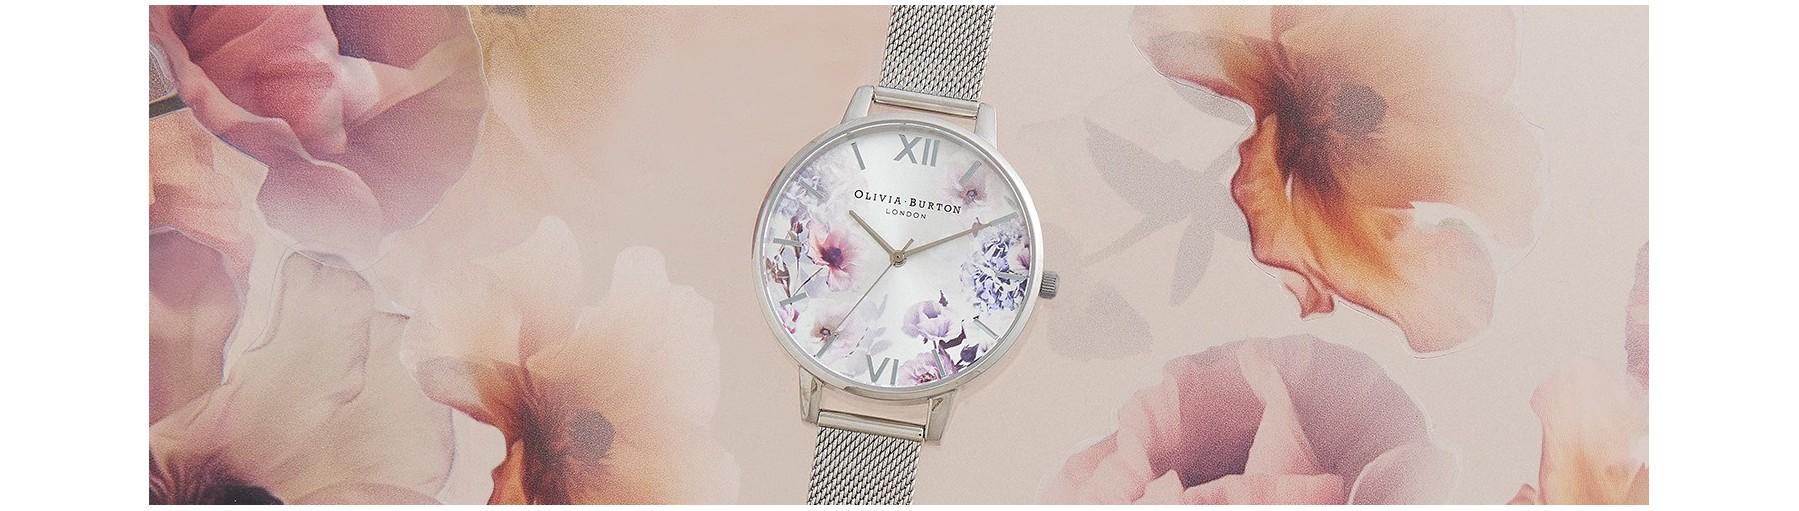 OLIVIA BURTON relojes